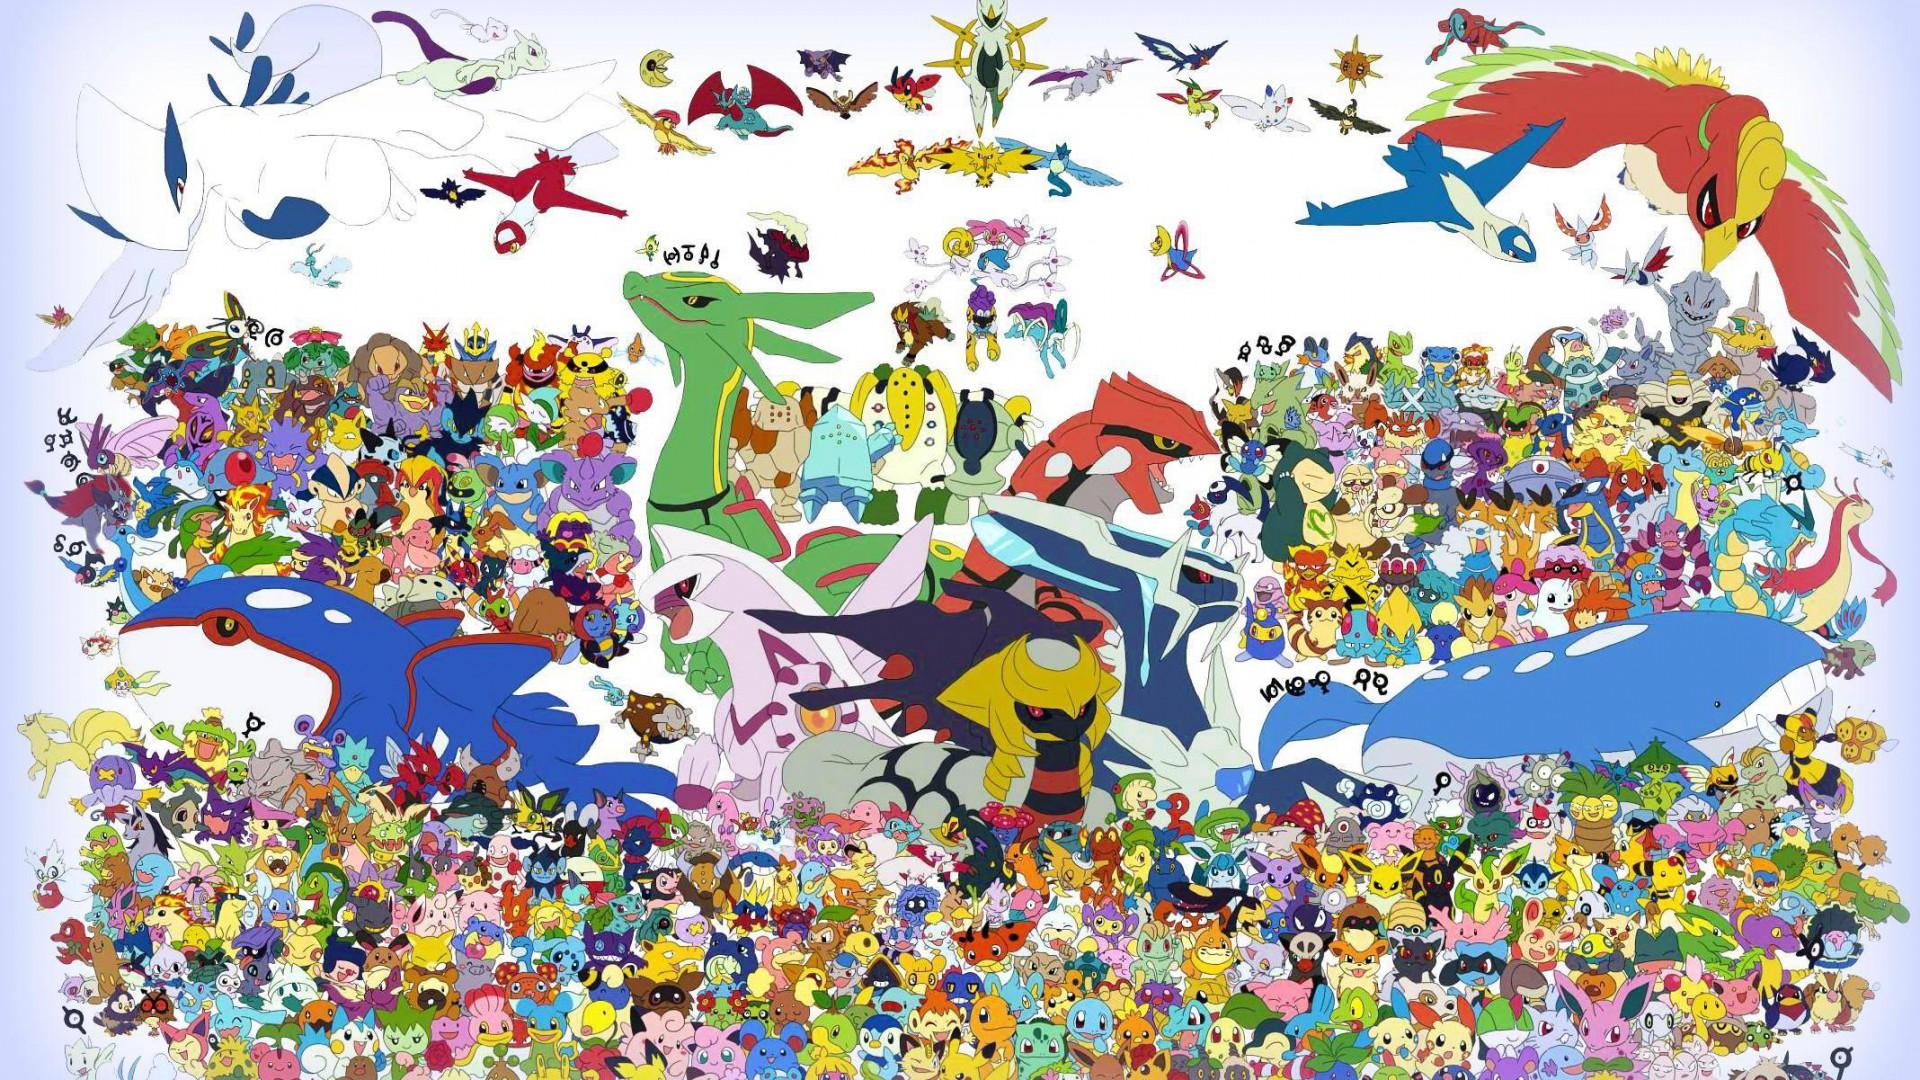 Pokemon Wallpaper 1920x1080 - WallpaperSafari